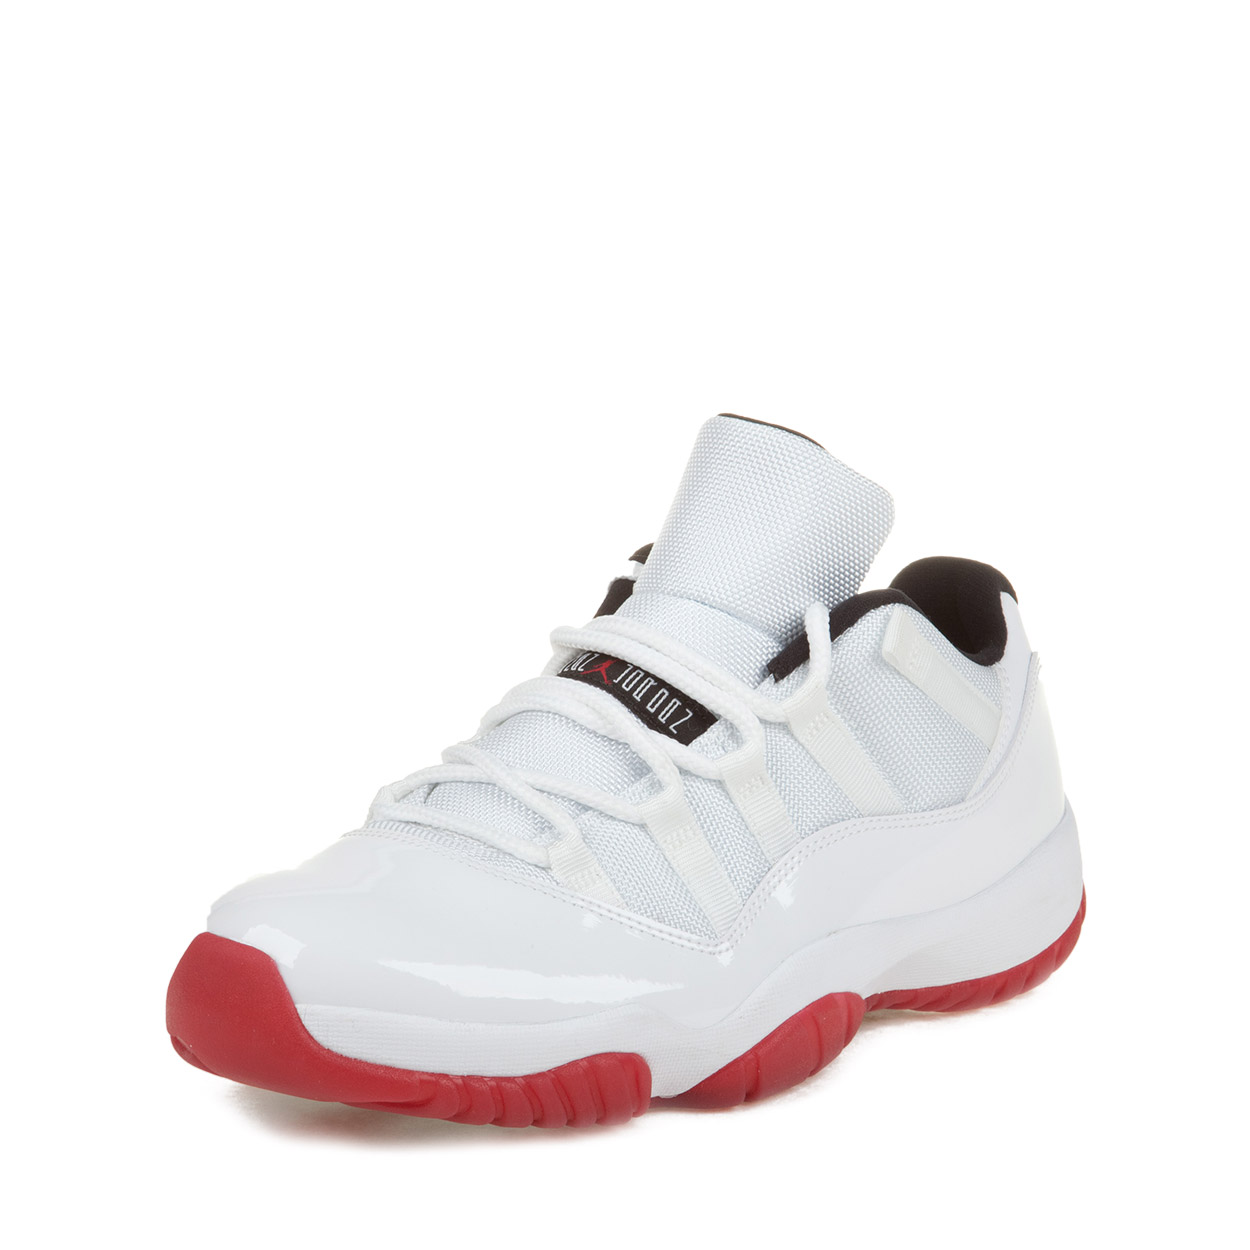 Nike Mens Air Jordan 11 Retro Low u0026quot;Cherryu0026quot; Varsity Red 528895-101 - Walmart.com